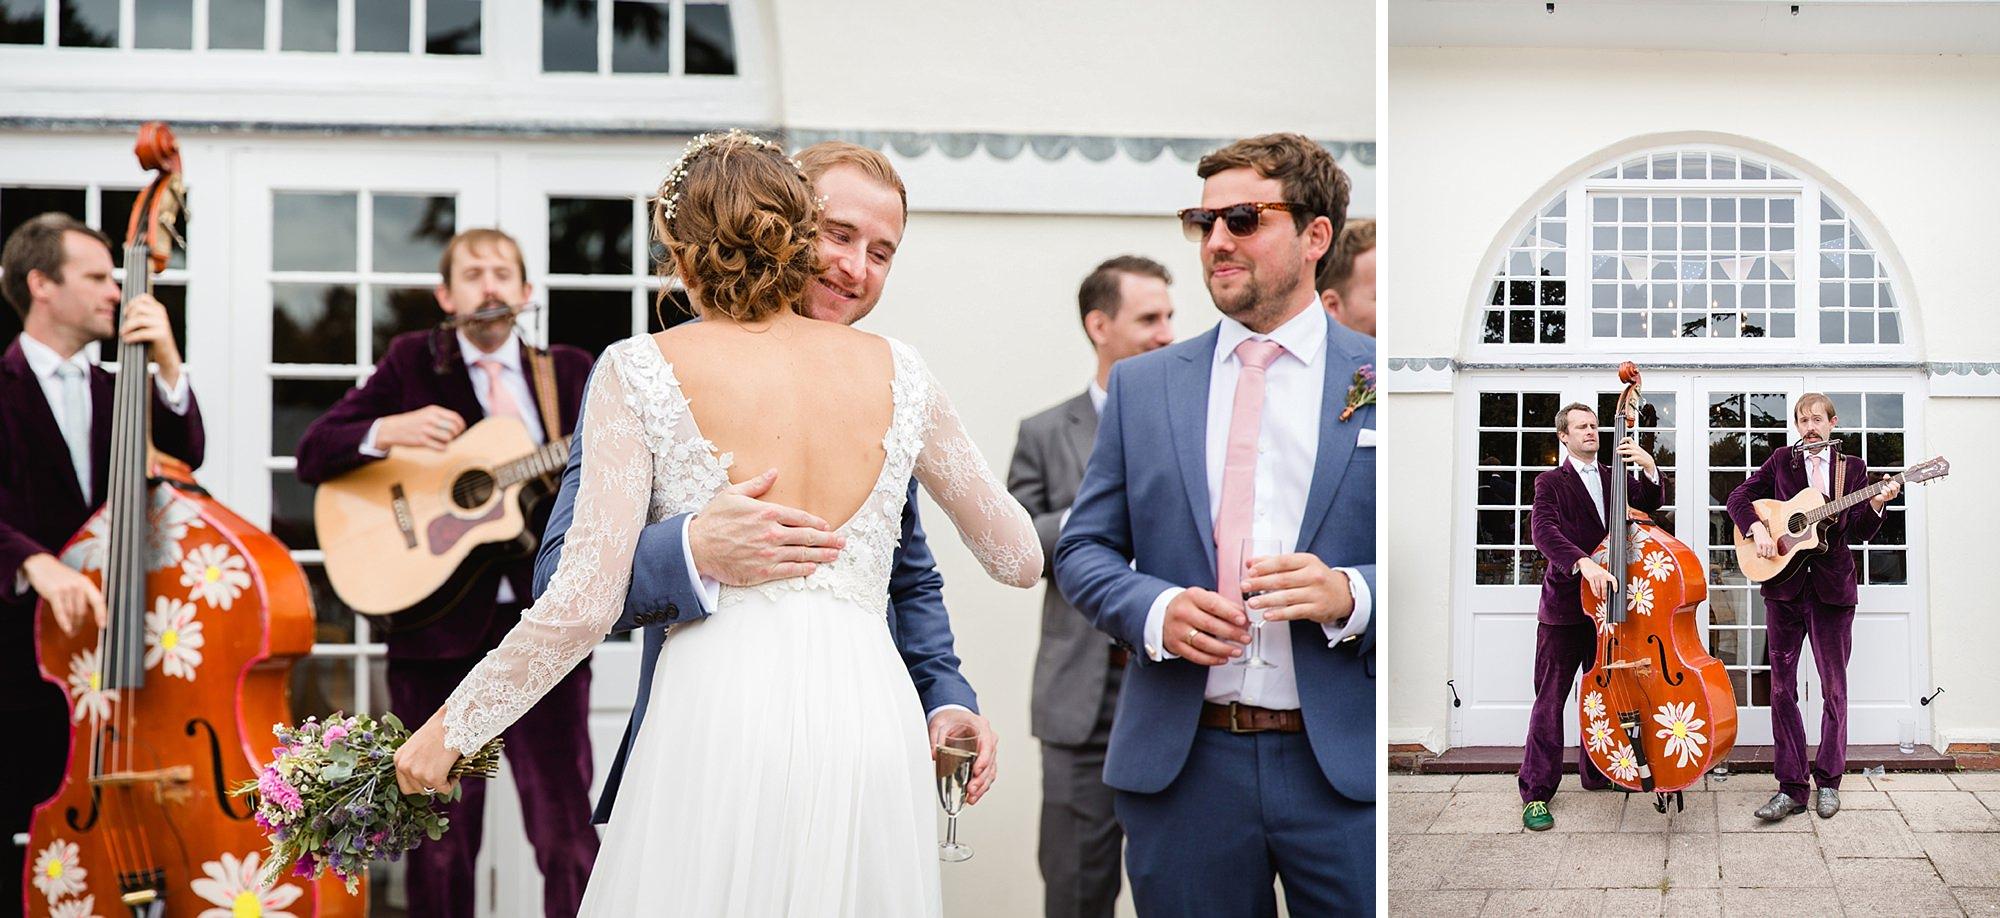 Marks Hall Estate wedding photography wedding guests and band at marks hall estate wedding